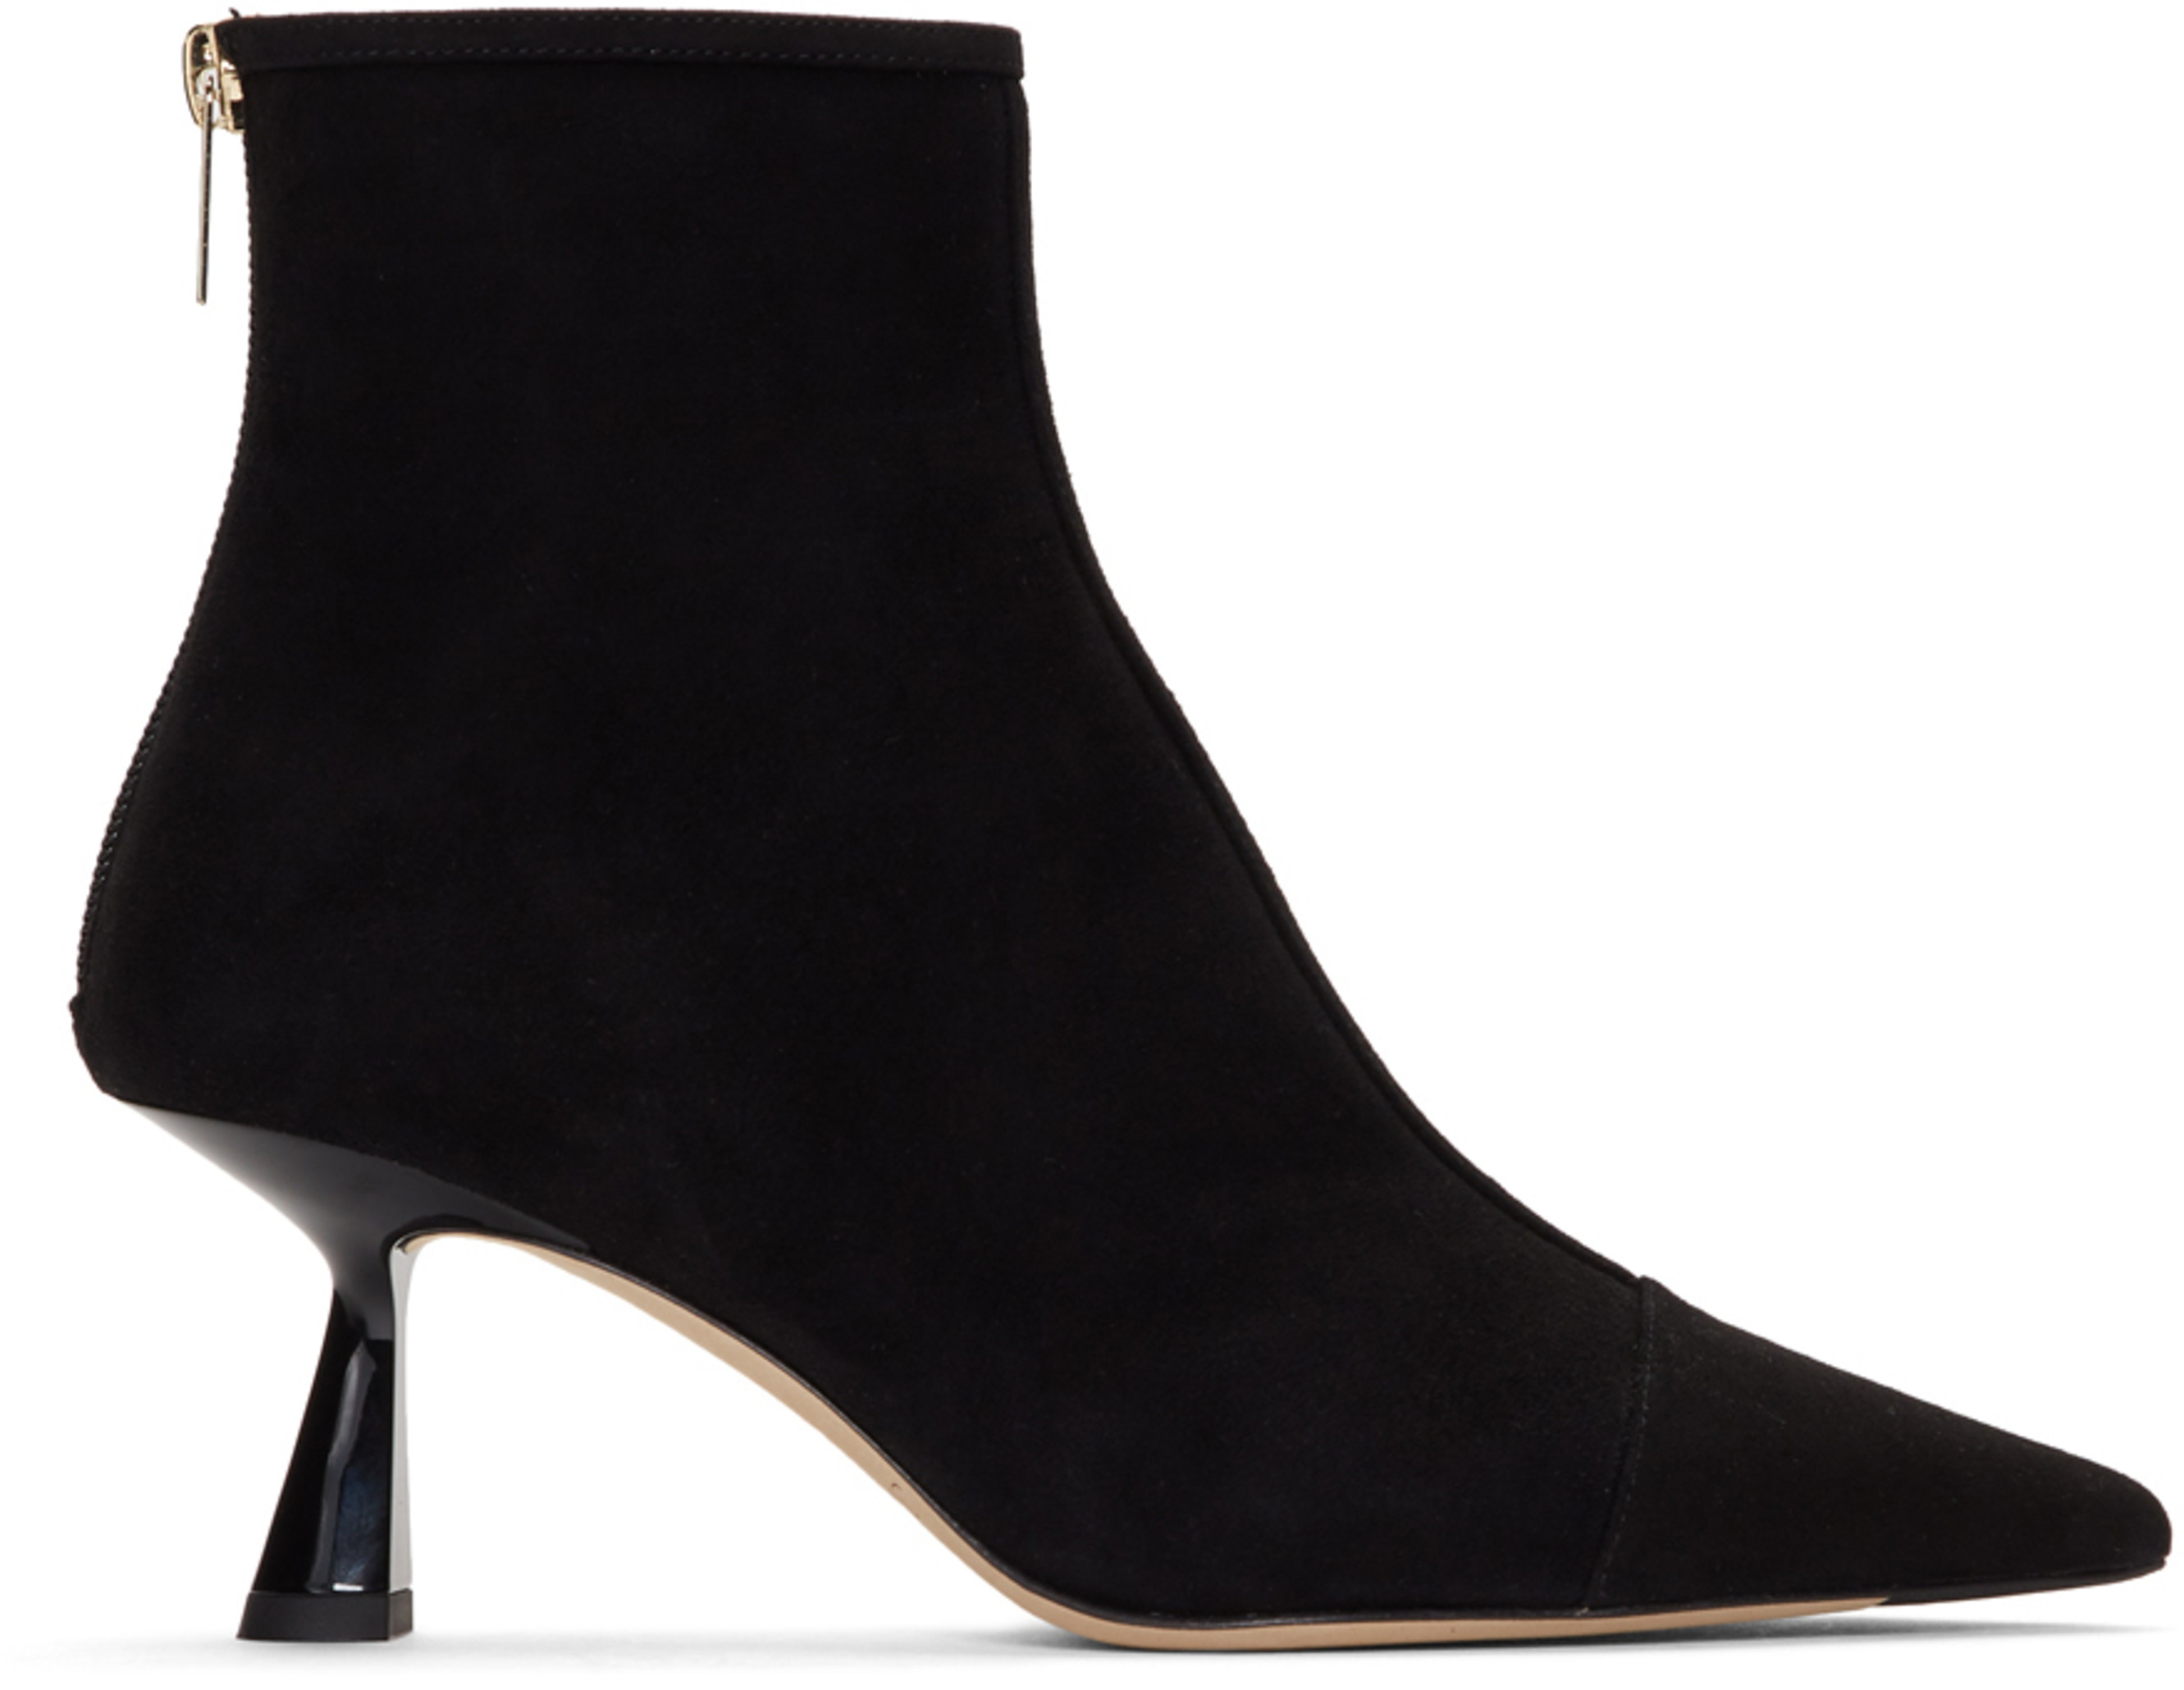 b9efefcbe21 Designer boots for Women | SSENSE Canada